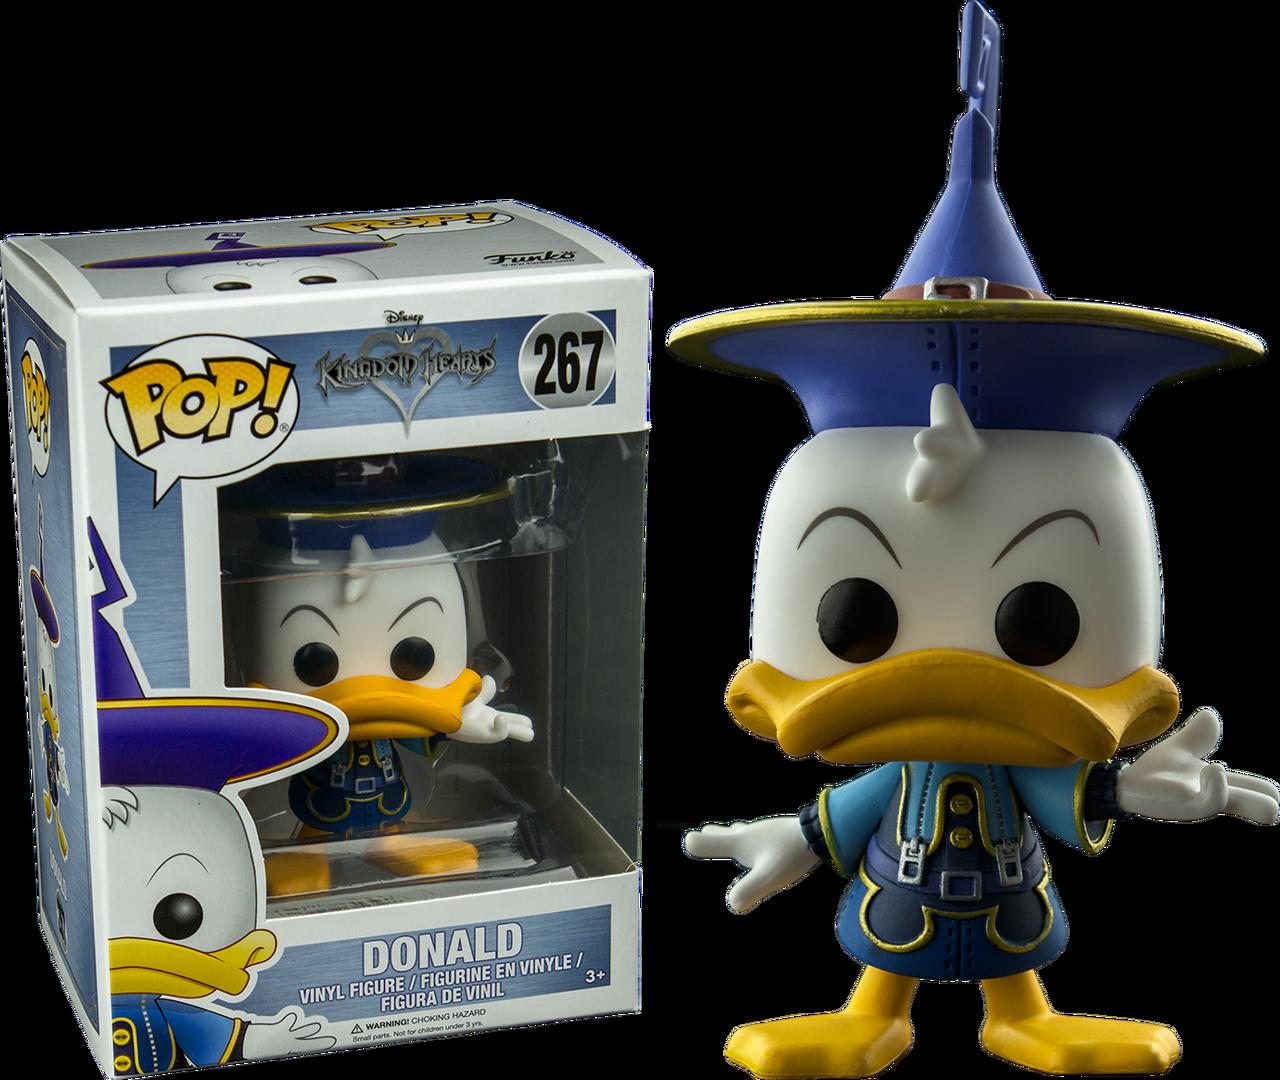 0111b984194 ... Kingdom Hearts – Donald Duck (Kingdom) US Exclusive Pop! Vinyl Figure.  Image 1